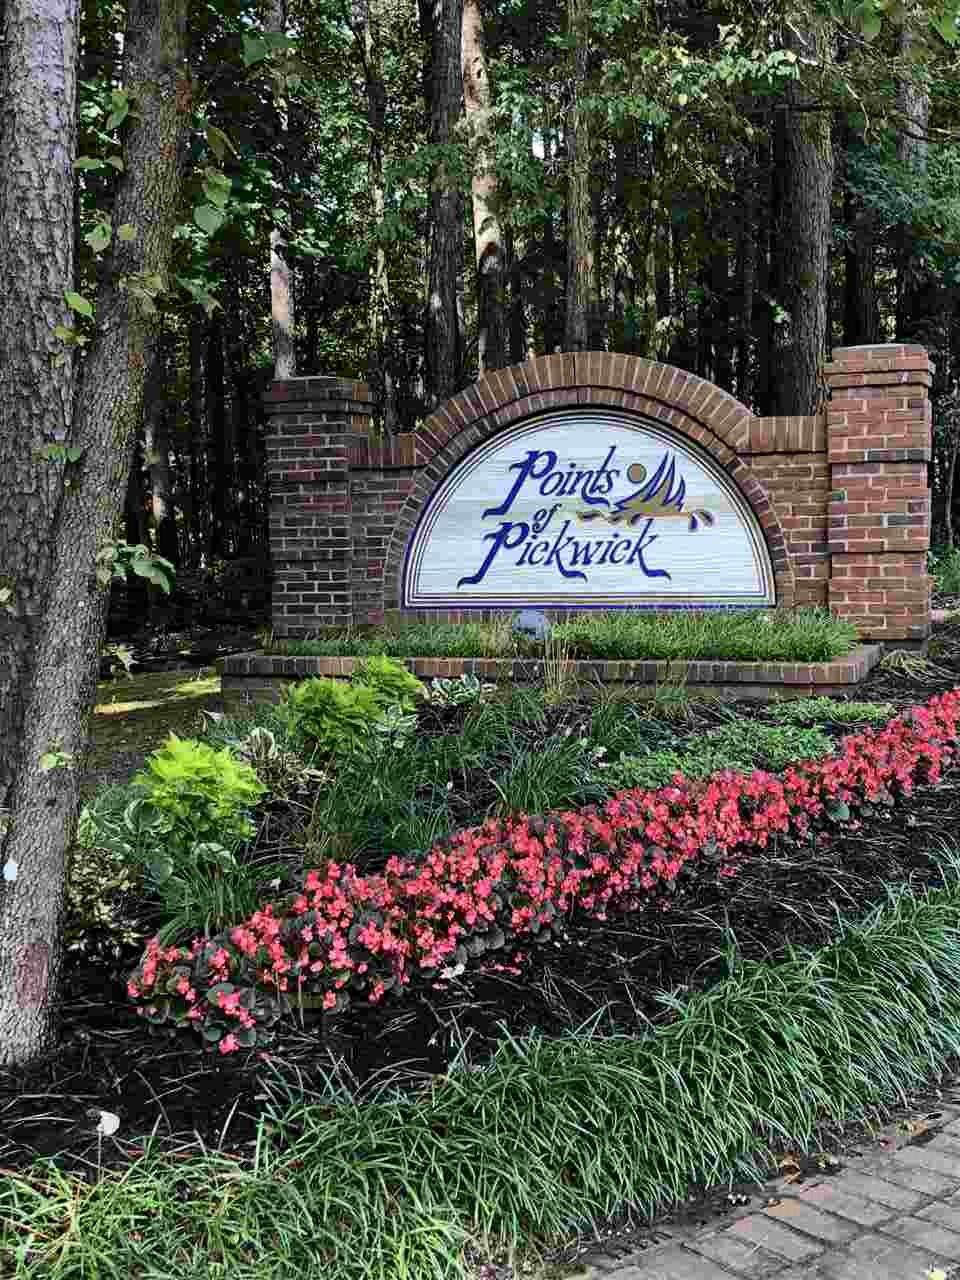 268/9 & 342a/b Anderson Hollow & Bluff Creek, Savannah, TN 38372